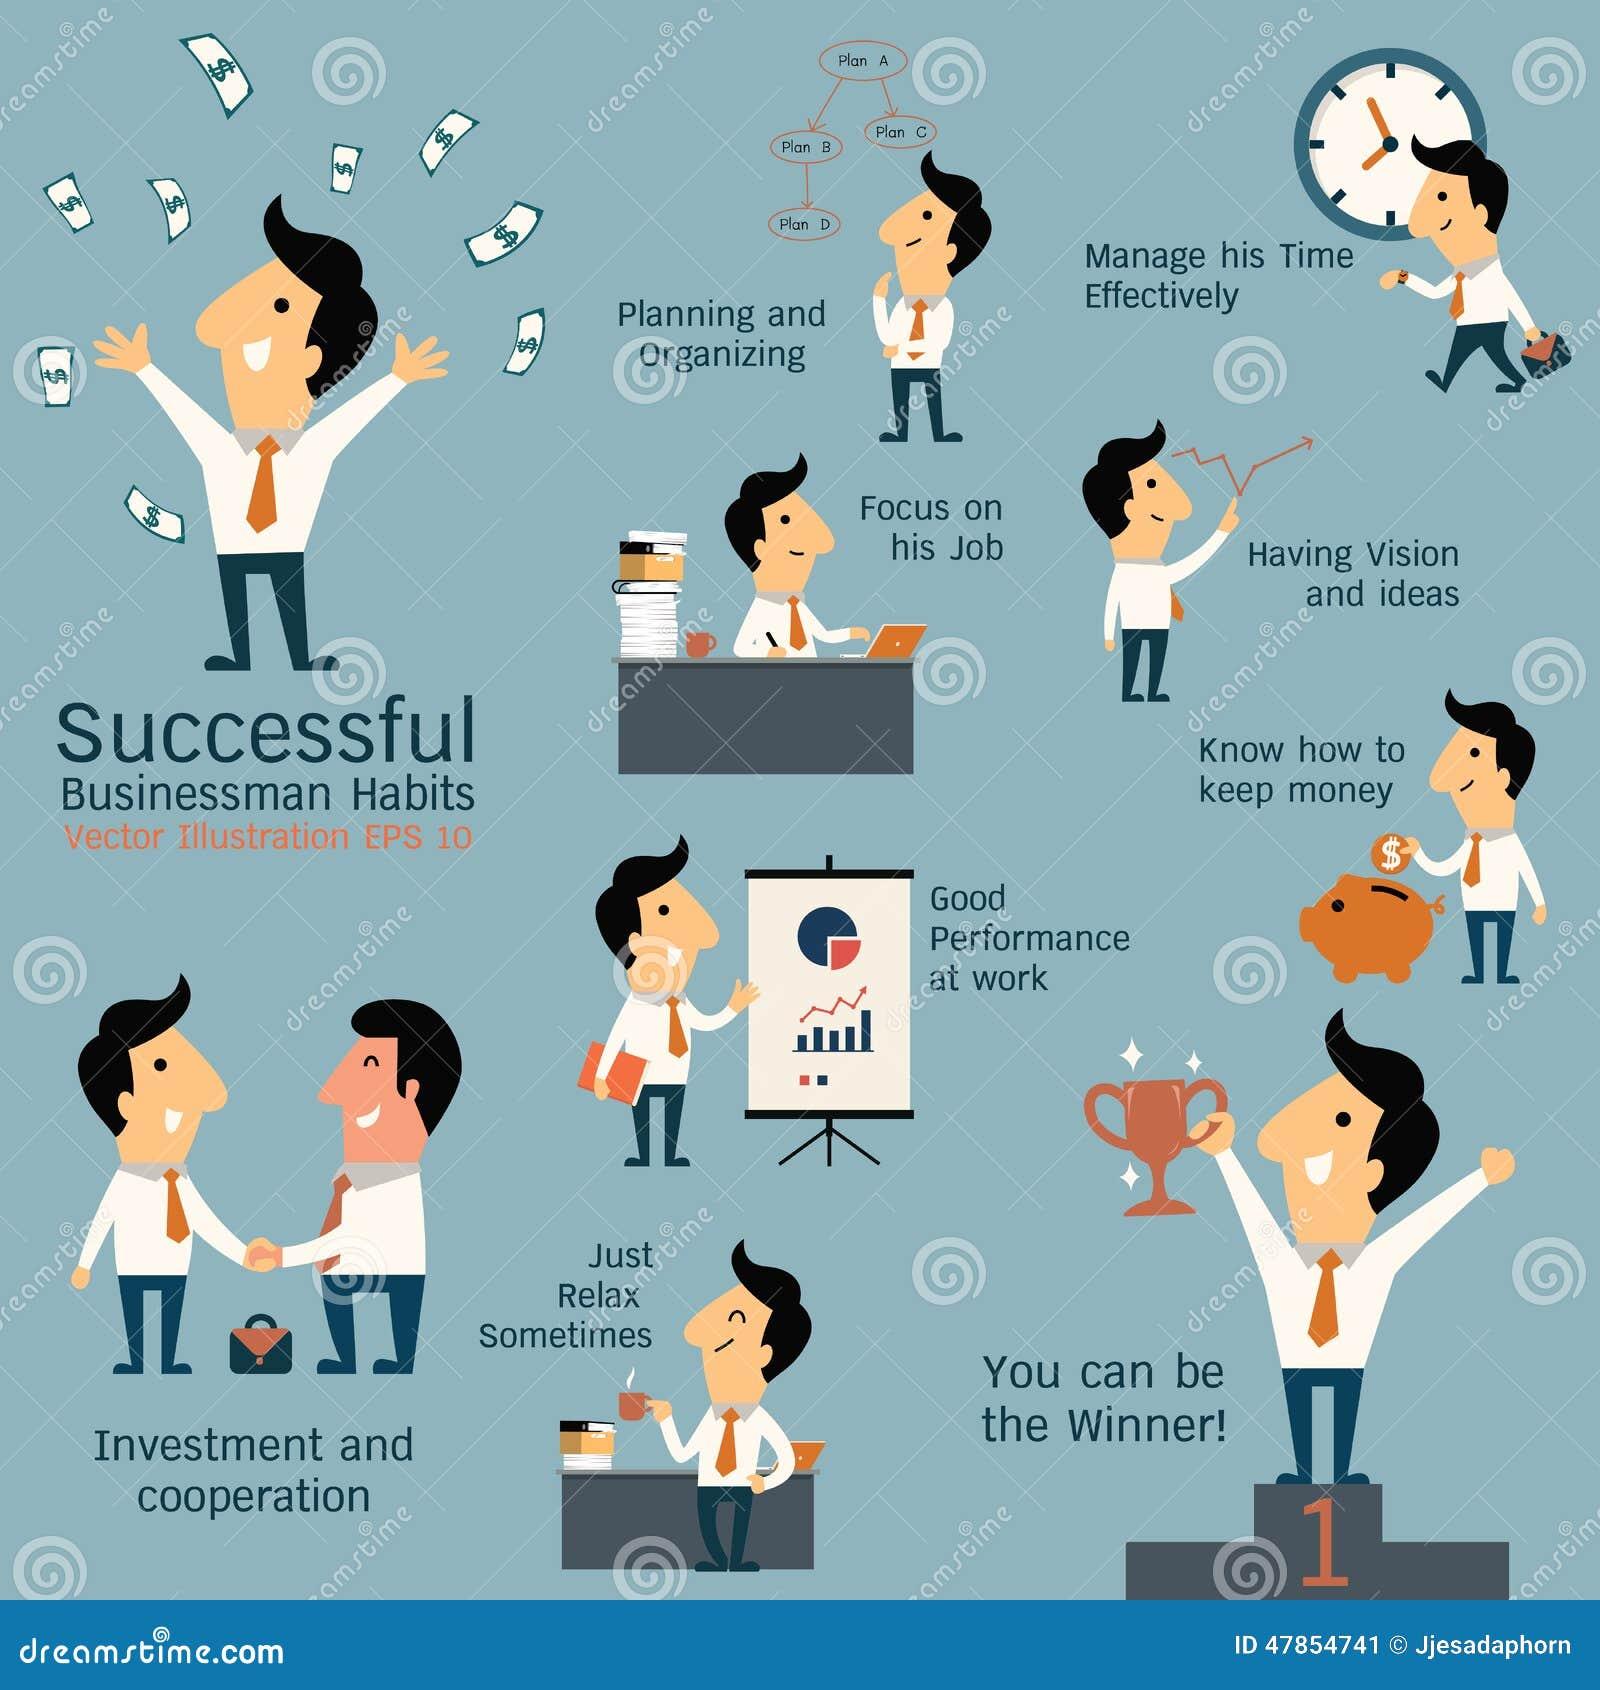 Successful Businessman Habits Stock Vector Image 47854741